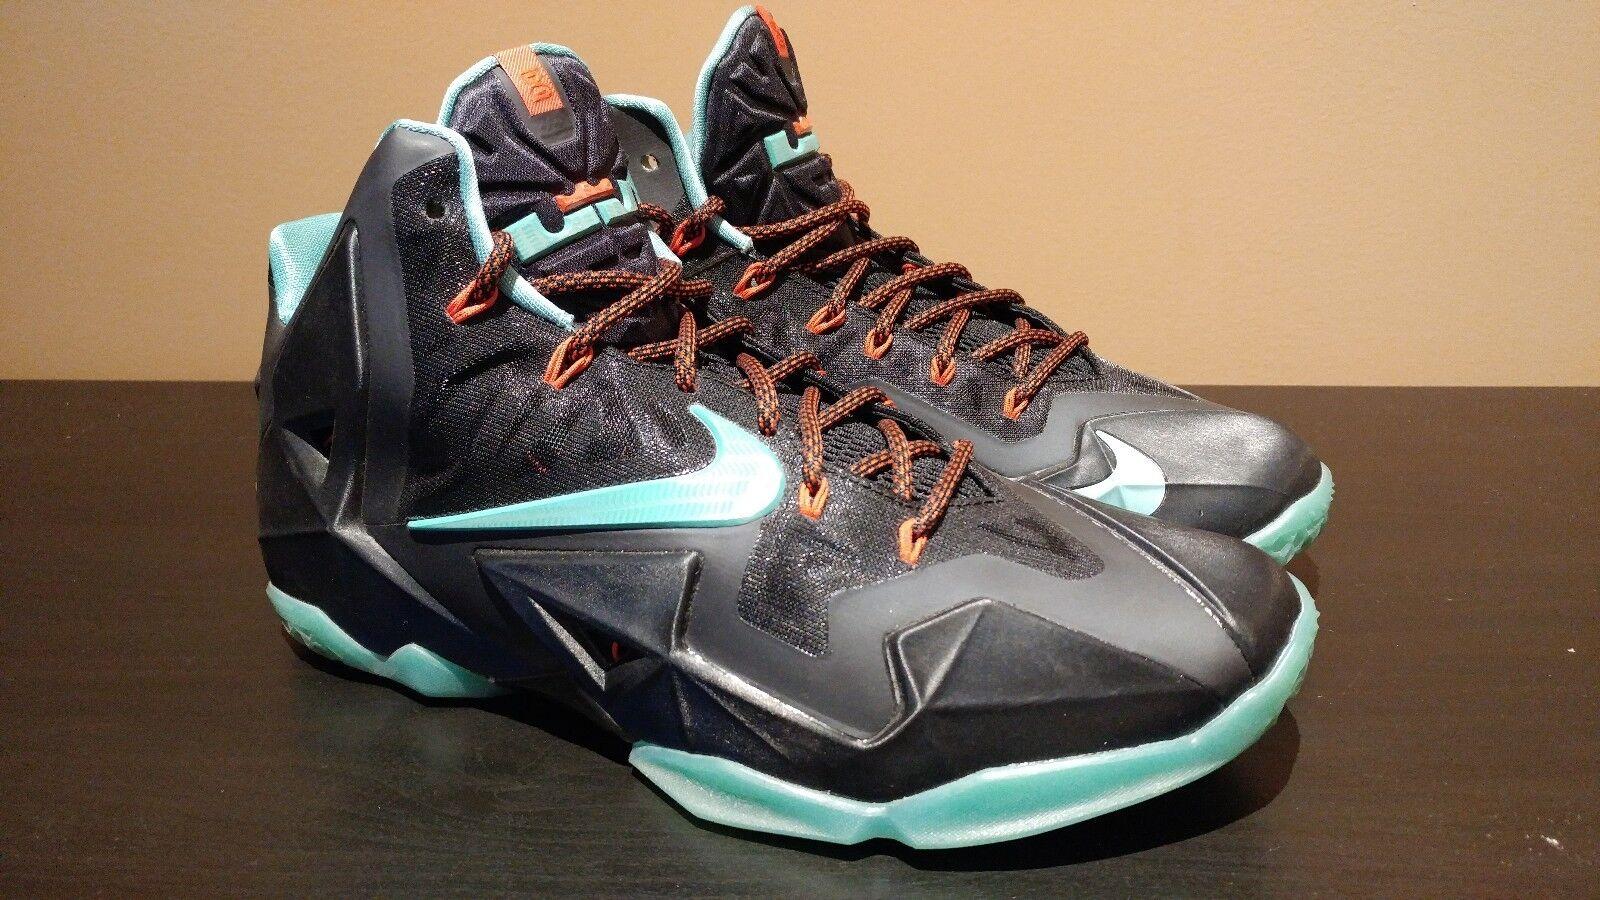 Nike LeBron 11 XI Diffused Jade VNDS 10.5 Red Carpet 2014